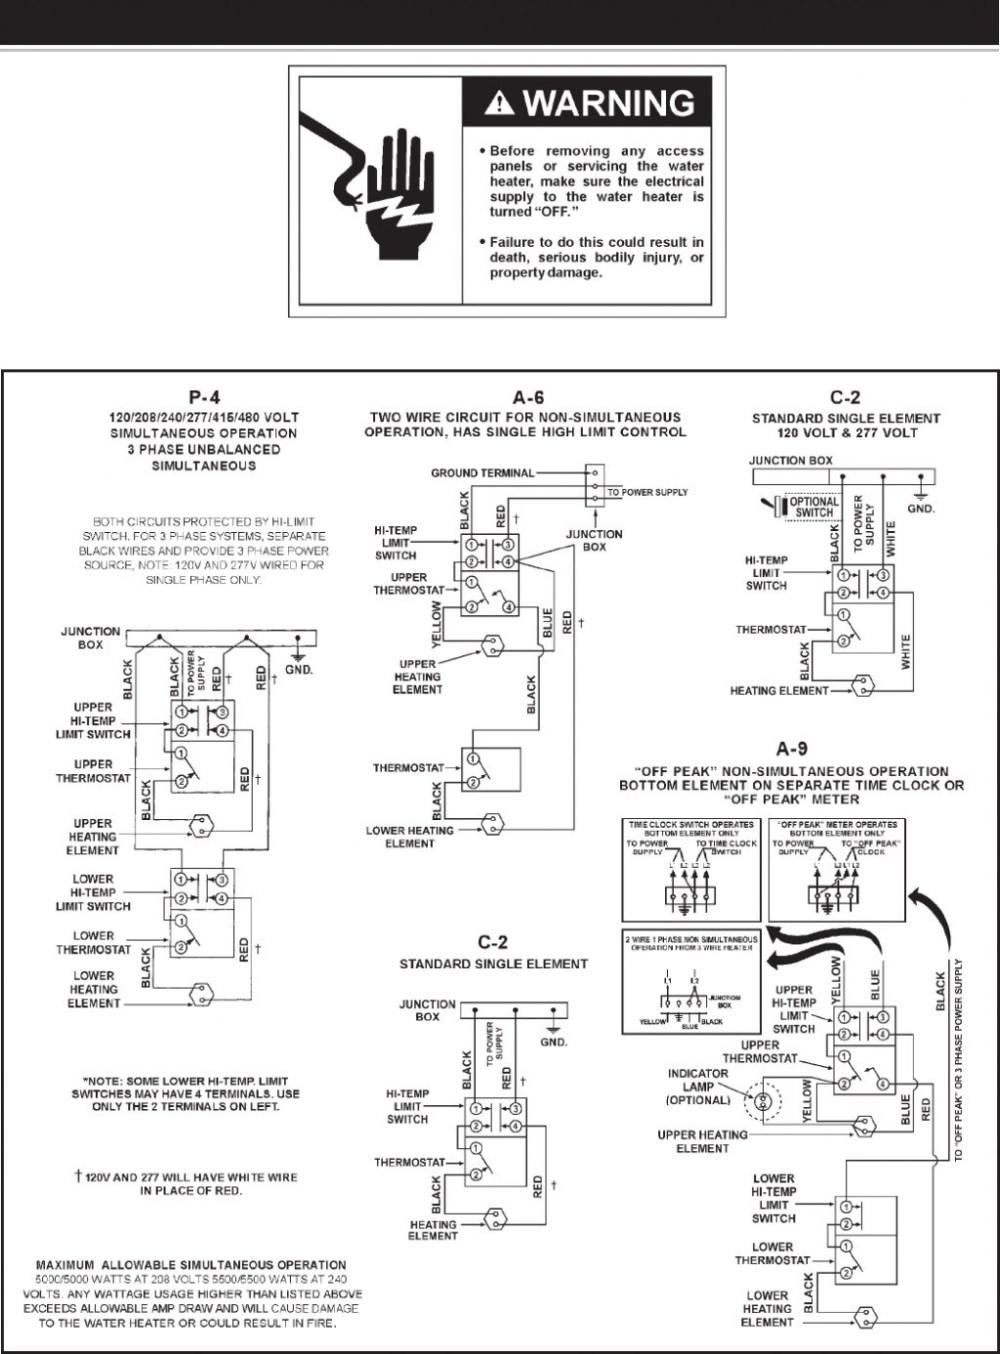 medium resolution of century d1026 wiring 220 wiring diagram wiring diagram a o smithcentury d1026 wiring 220 wiring diagram wiring